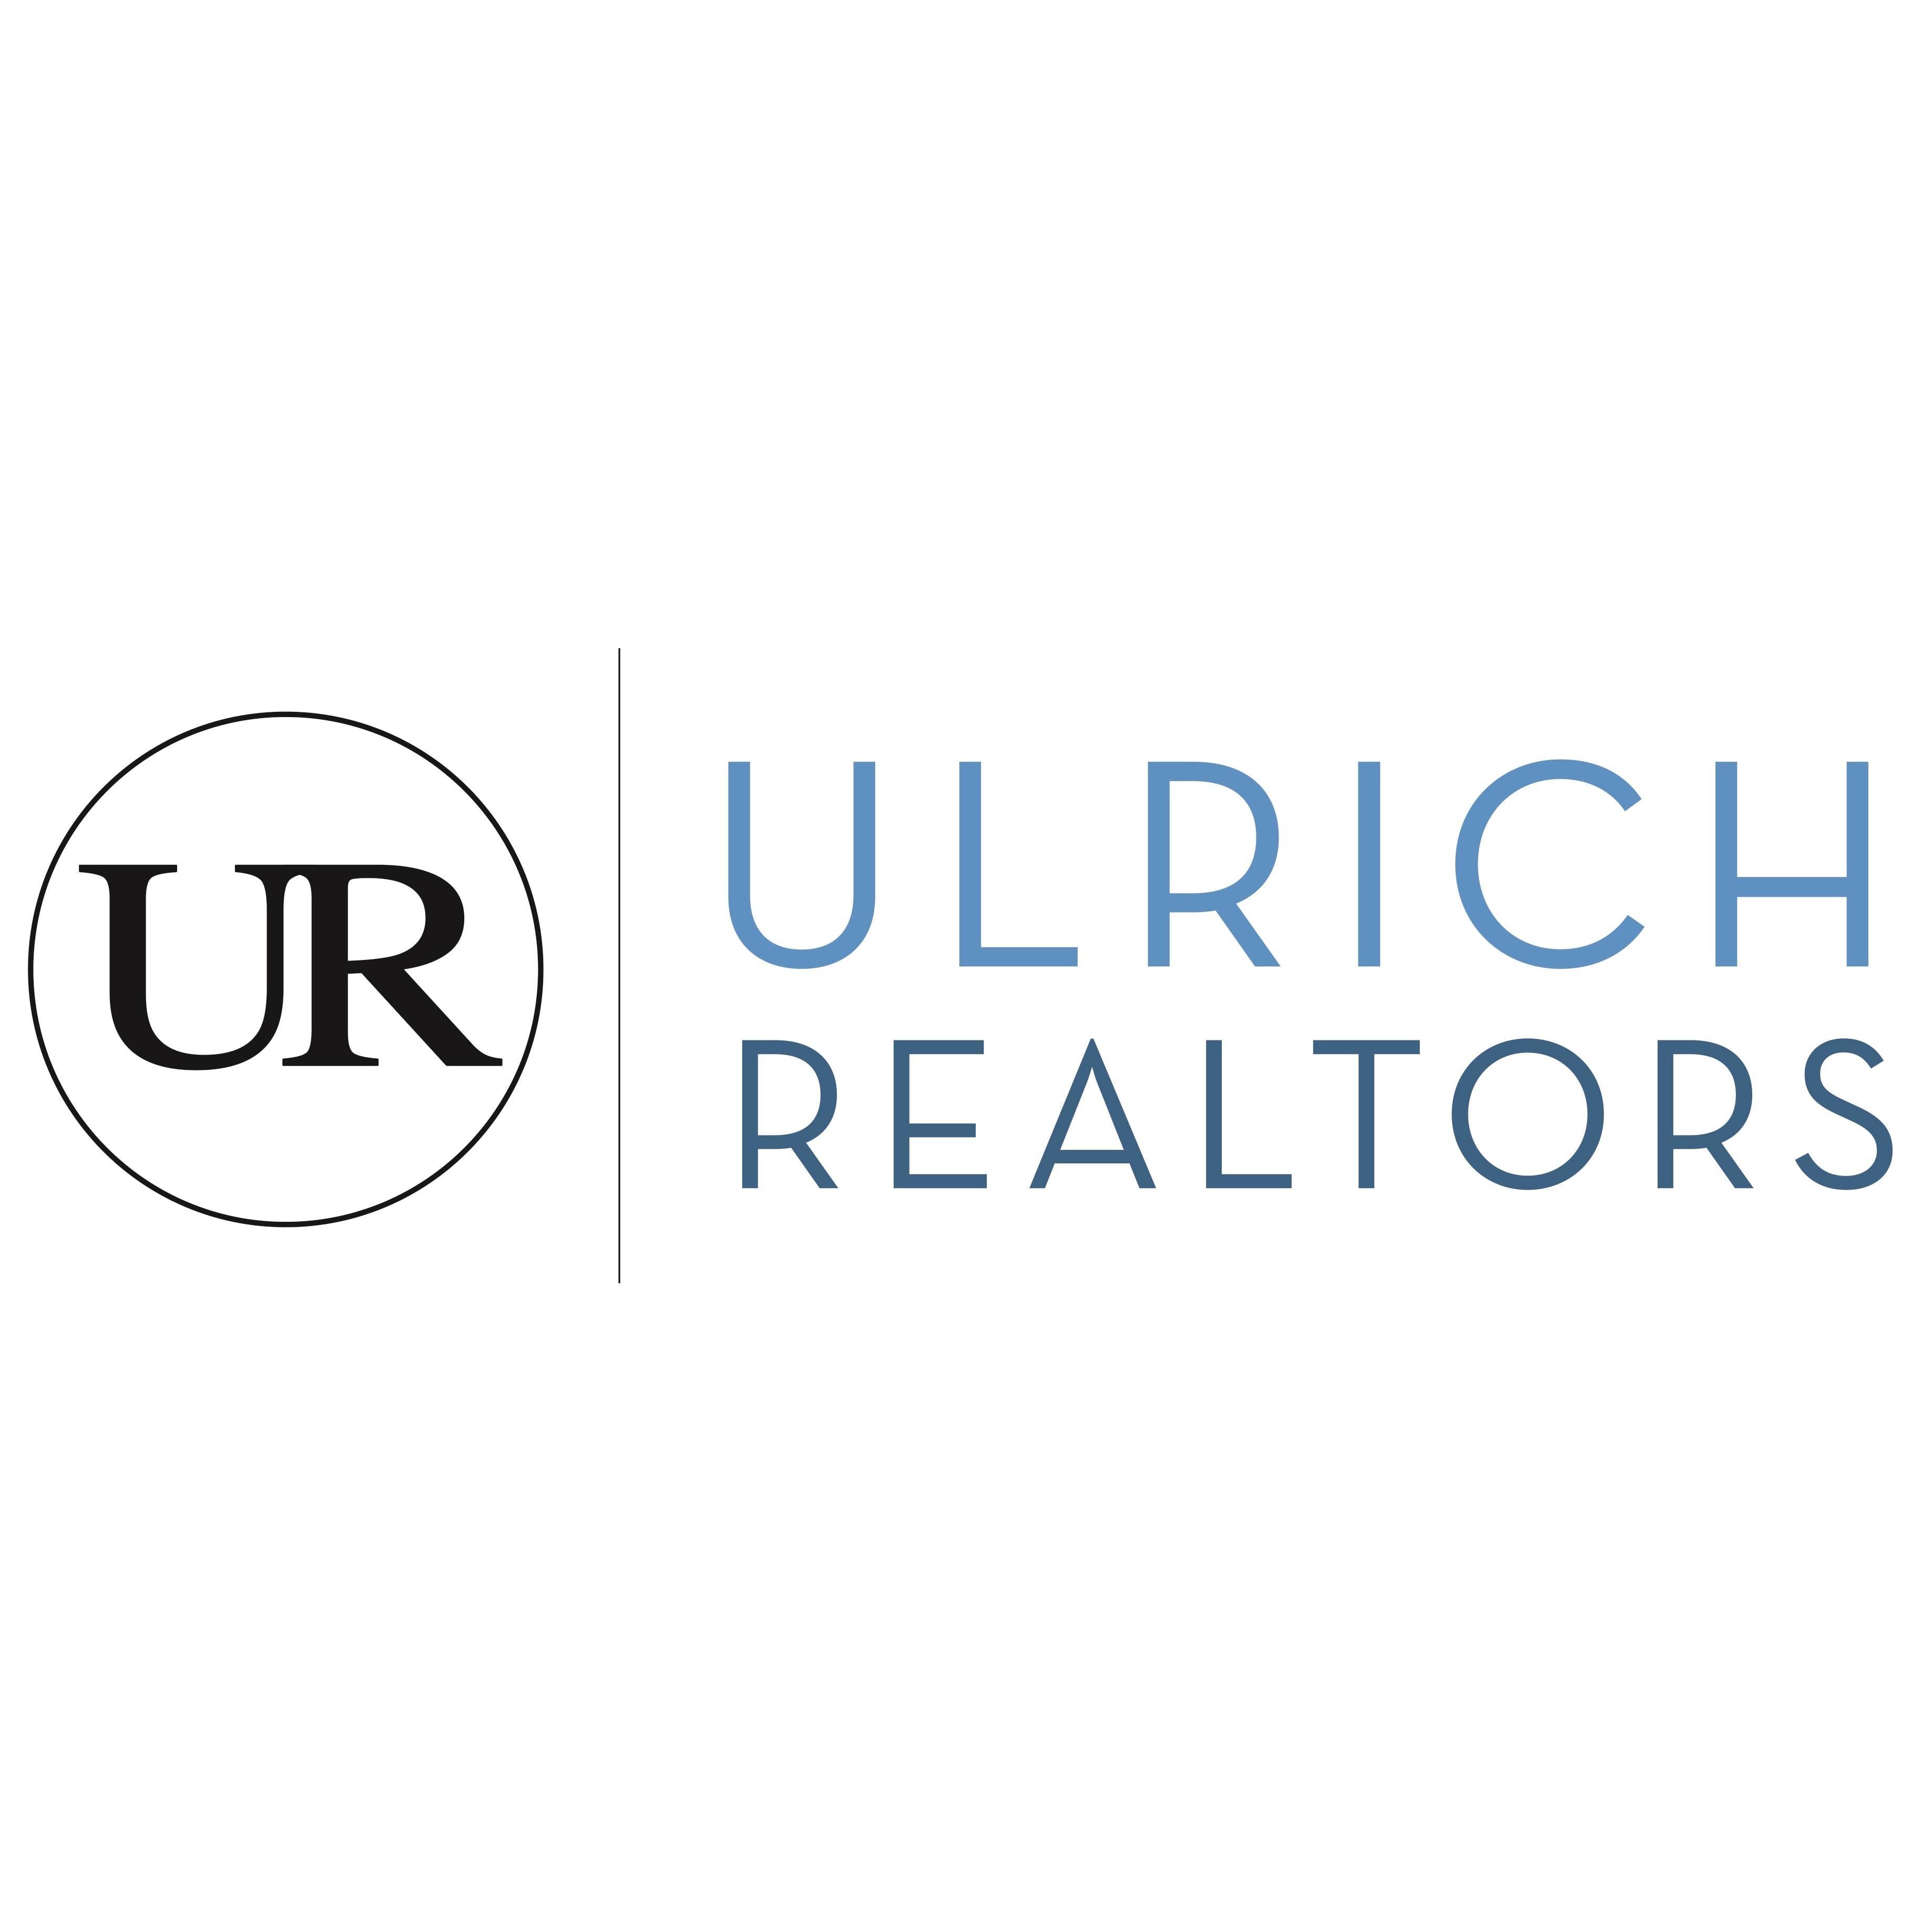 Kris Hudson Ulrich Realtors - Salt Lake City, UT - Real Estate Agents